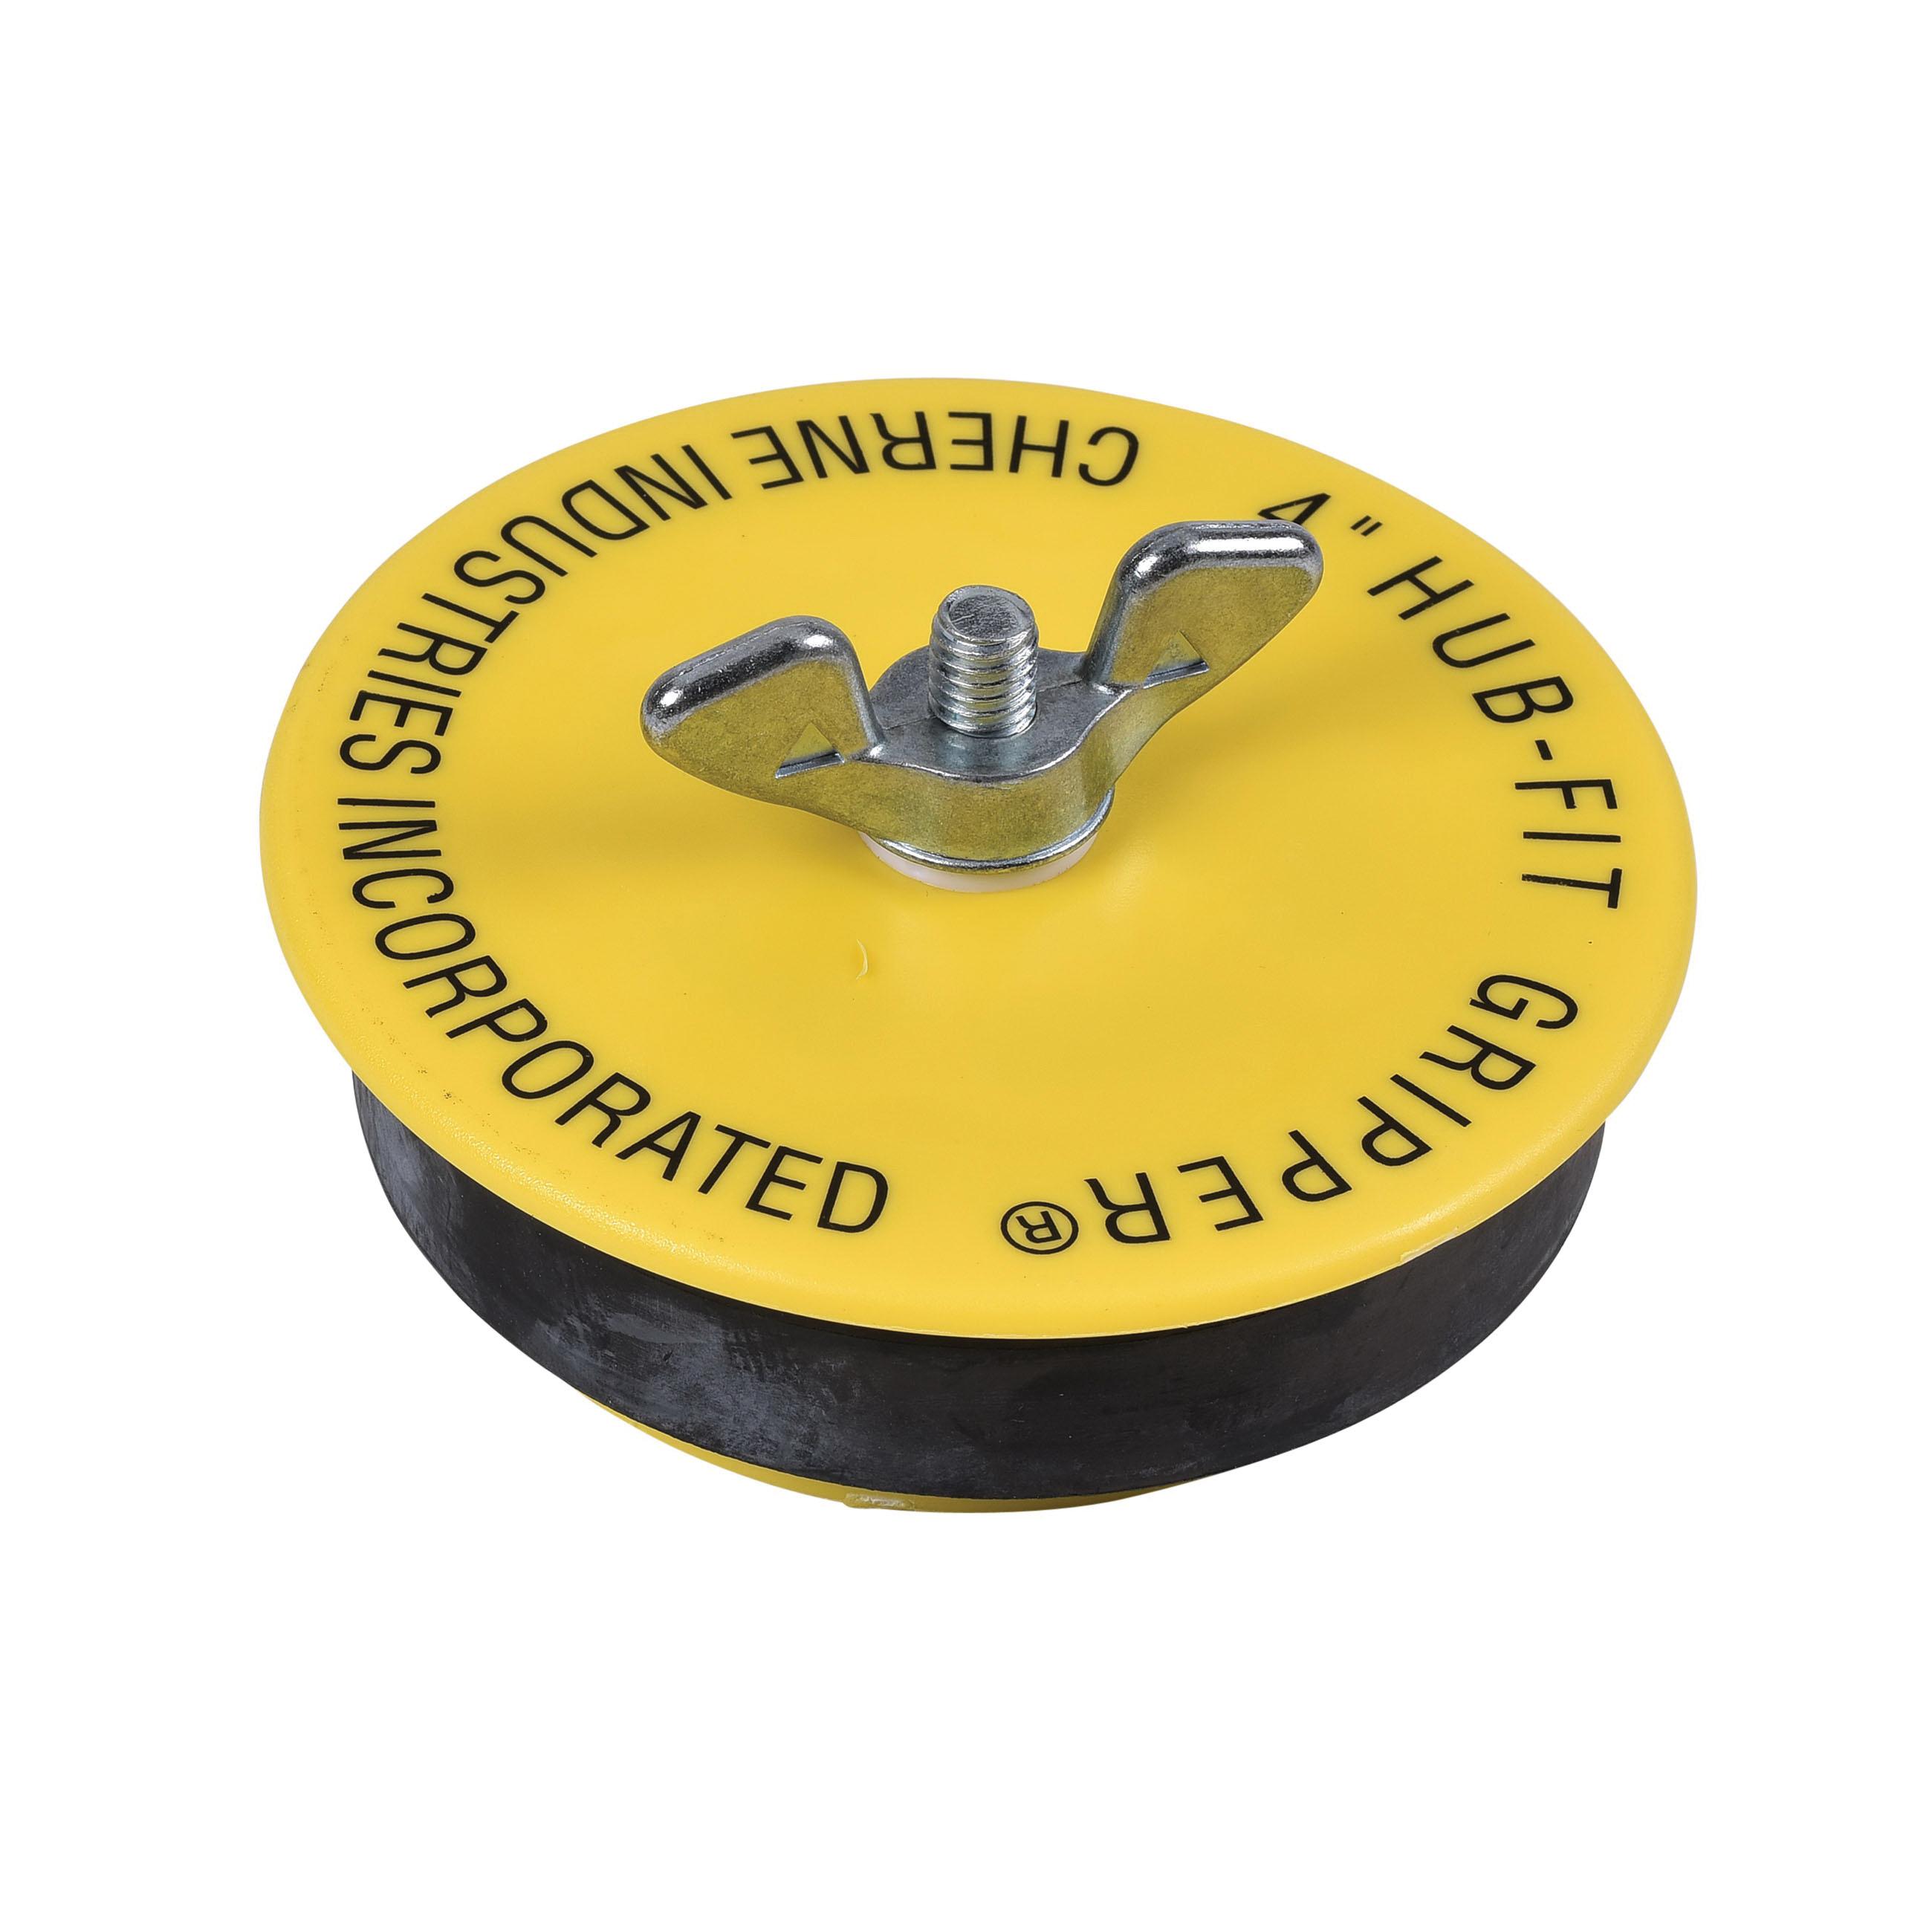 Cherne® Hub-Fit Gripper® 270548 Mechanical Pipe Plug, 12 in, ABS